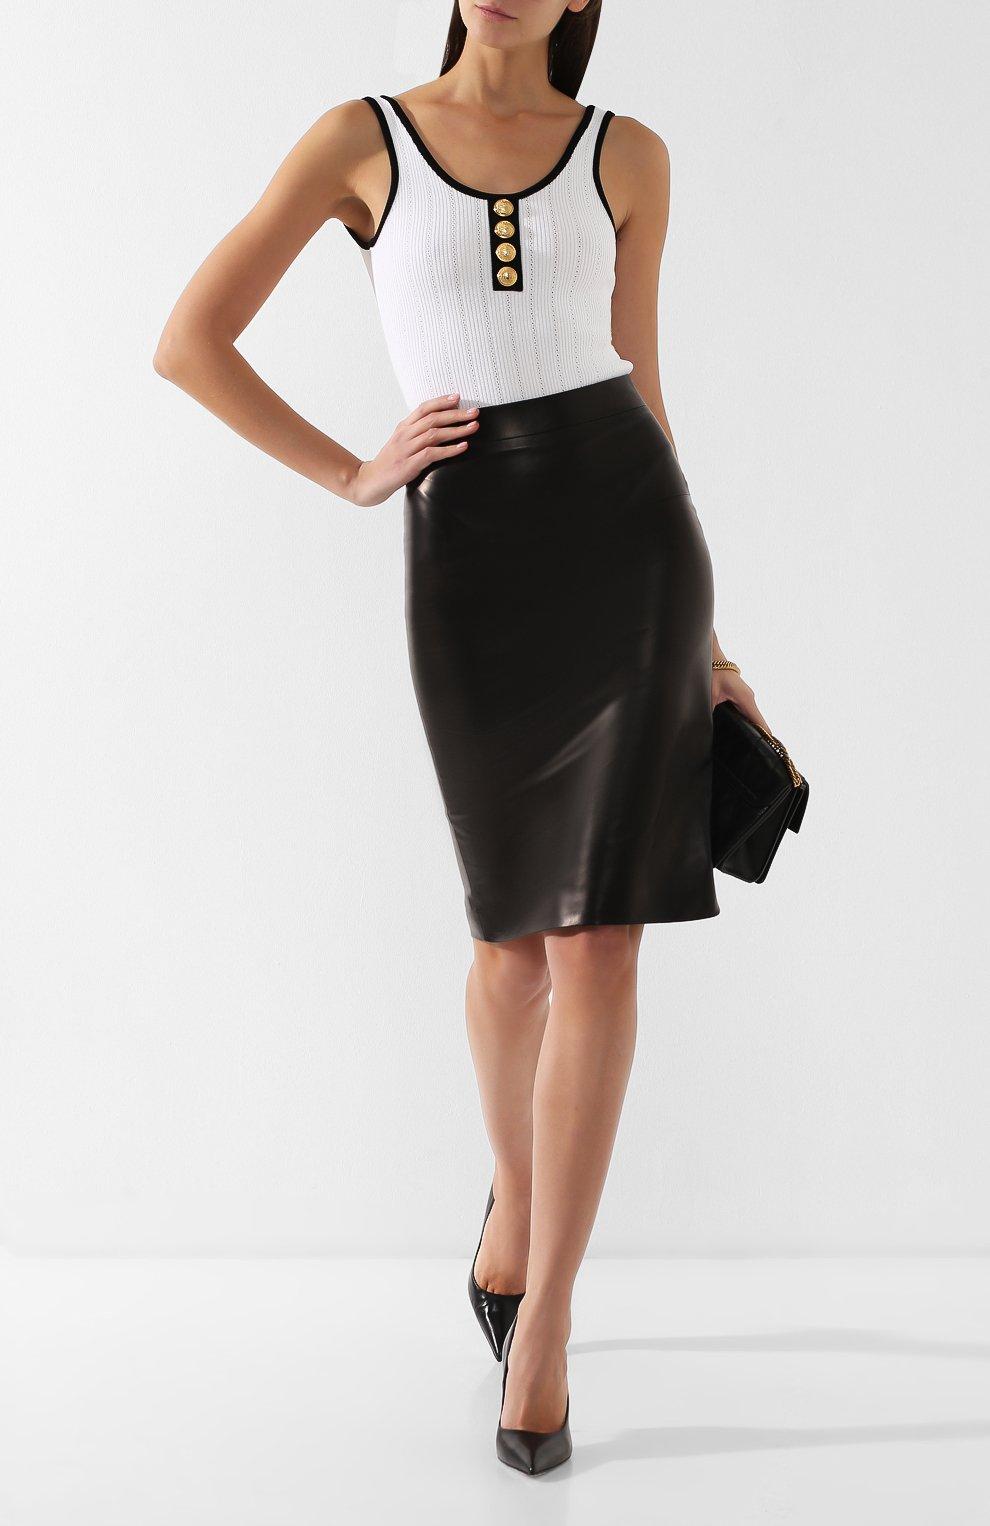 Кожаная юбка-карандаш | Фото №2